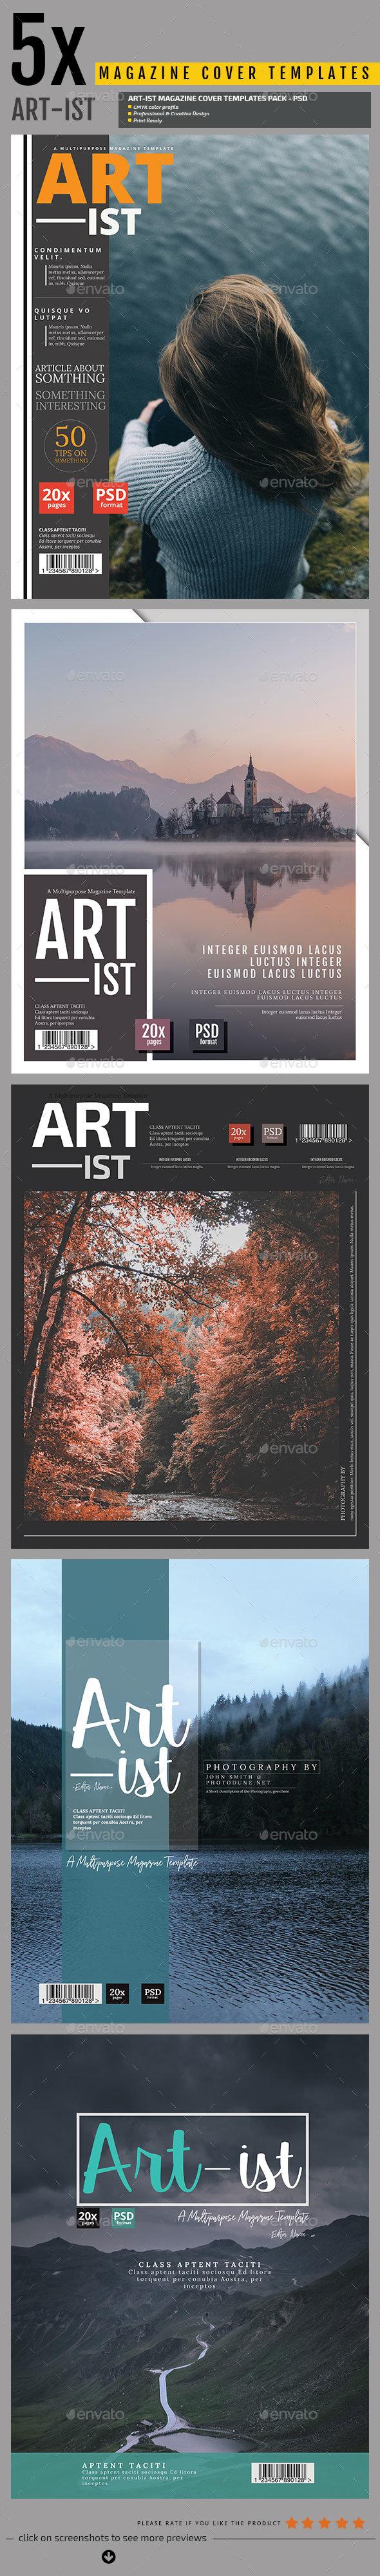 5in1 Magazine Cover Templates V.3 - Magazines Print Templates